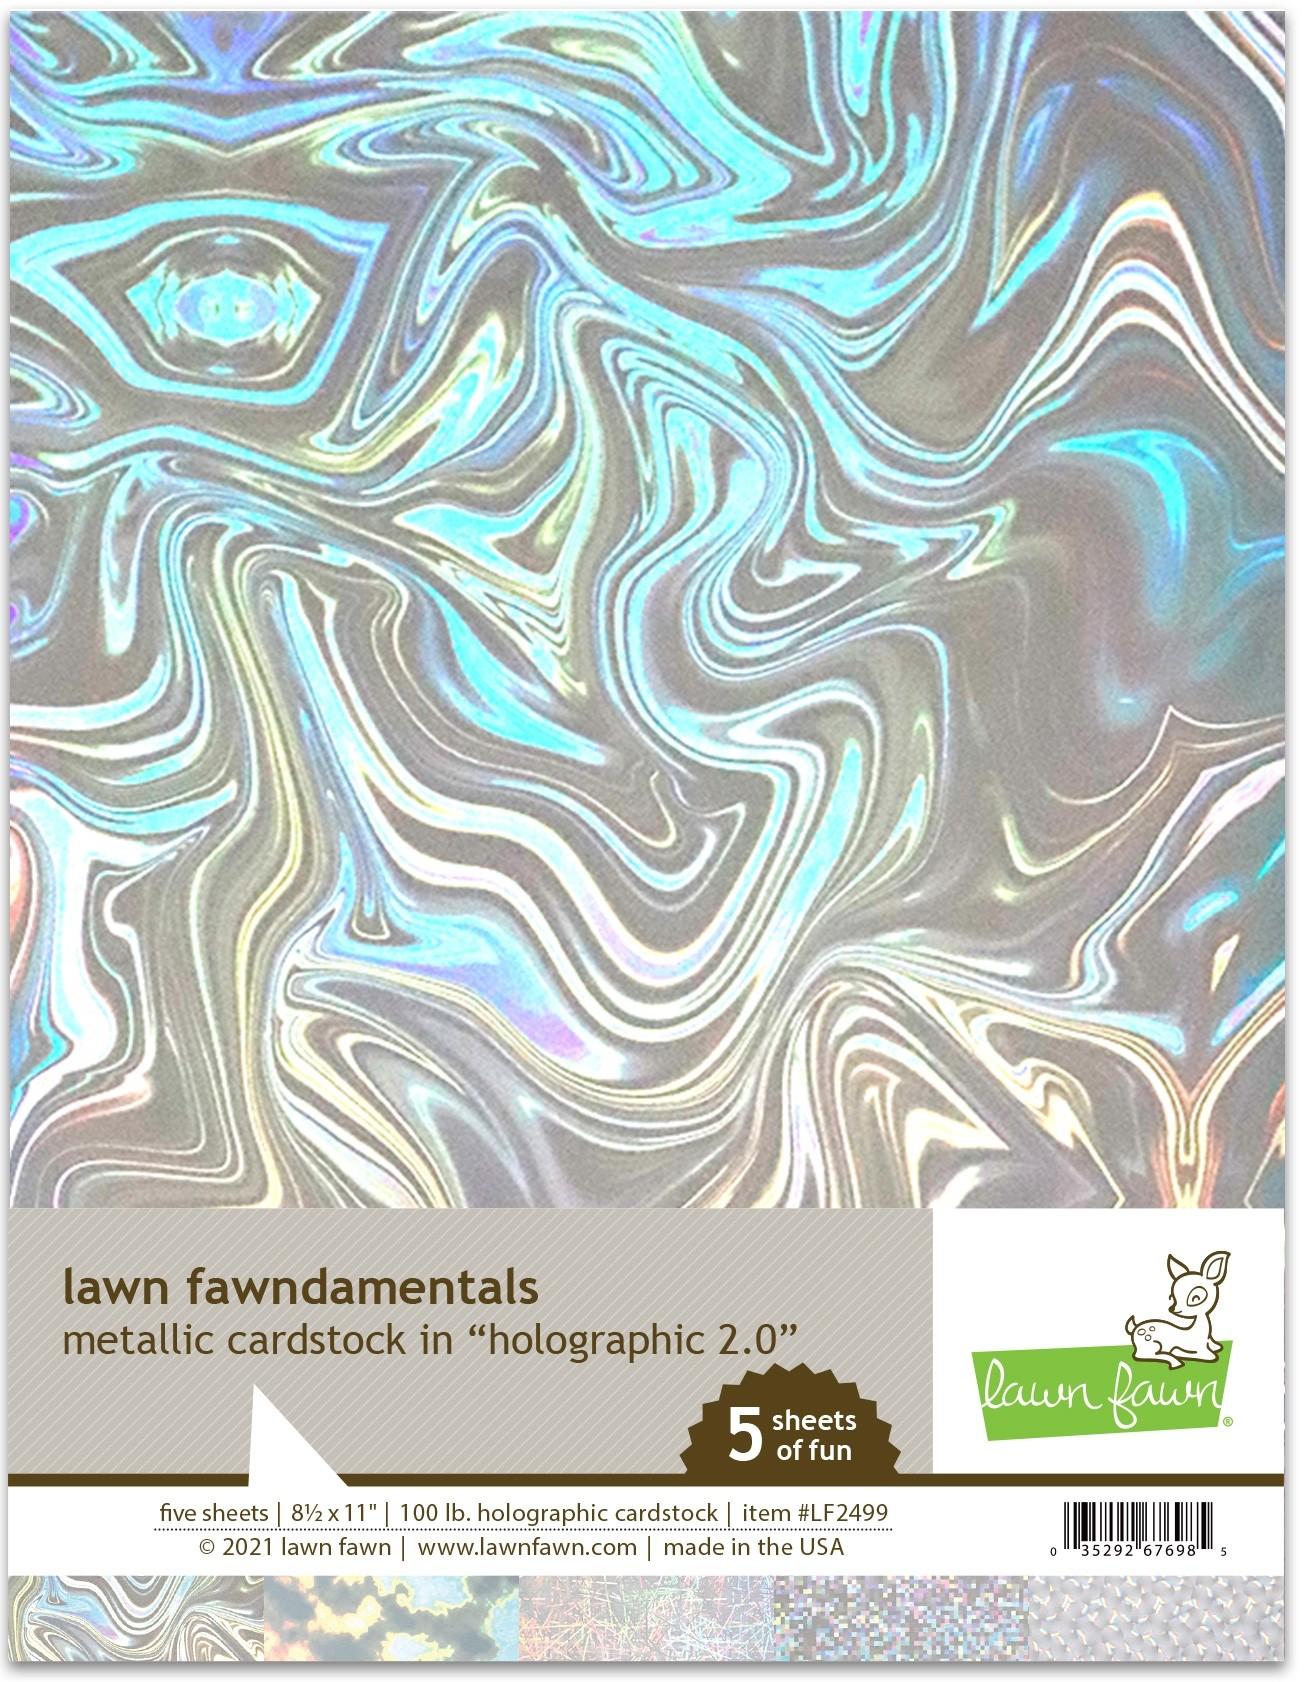 Lawn Fawn Metallic Cardstock - holographic 2.0